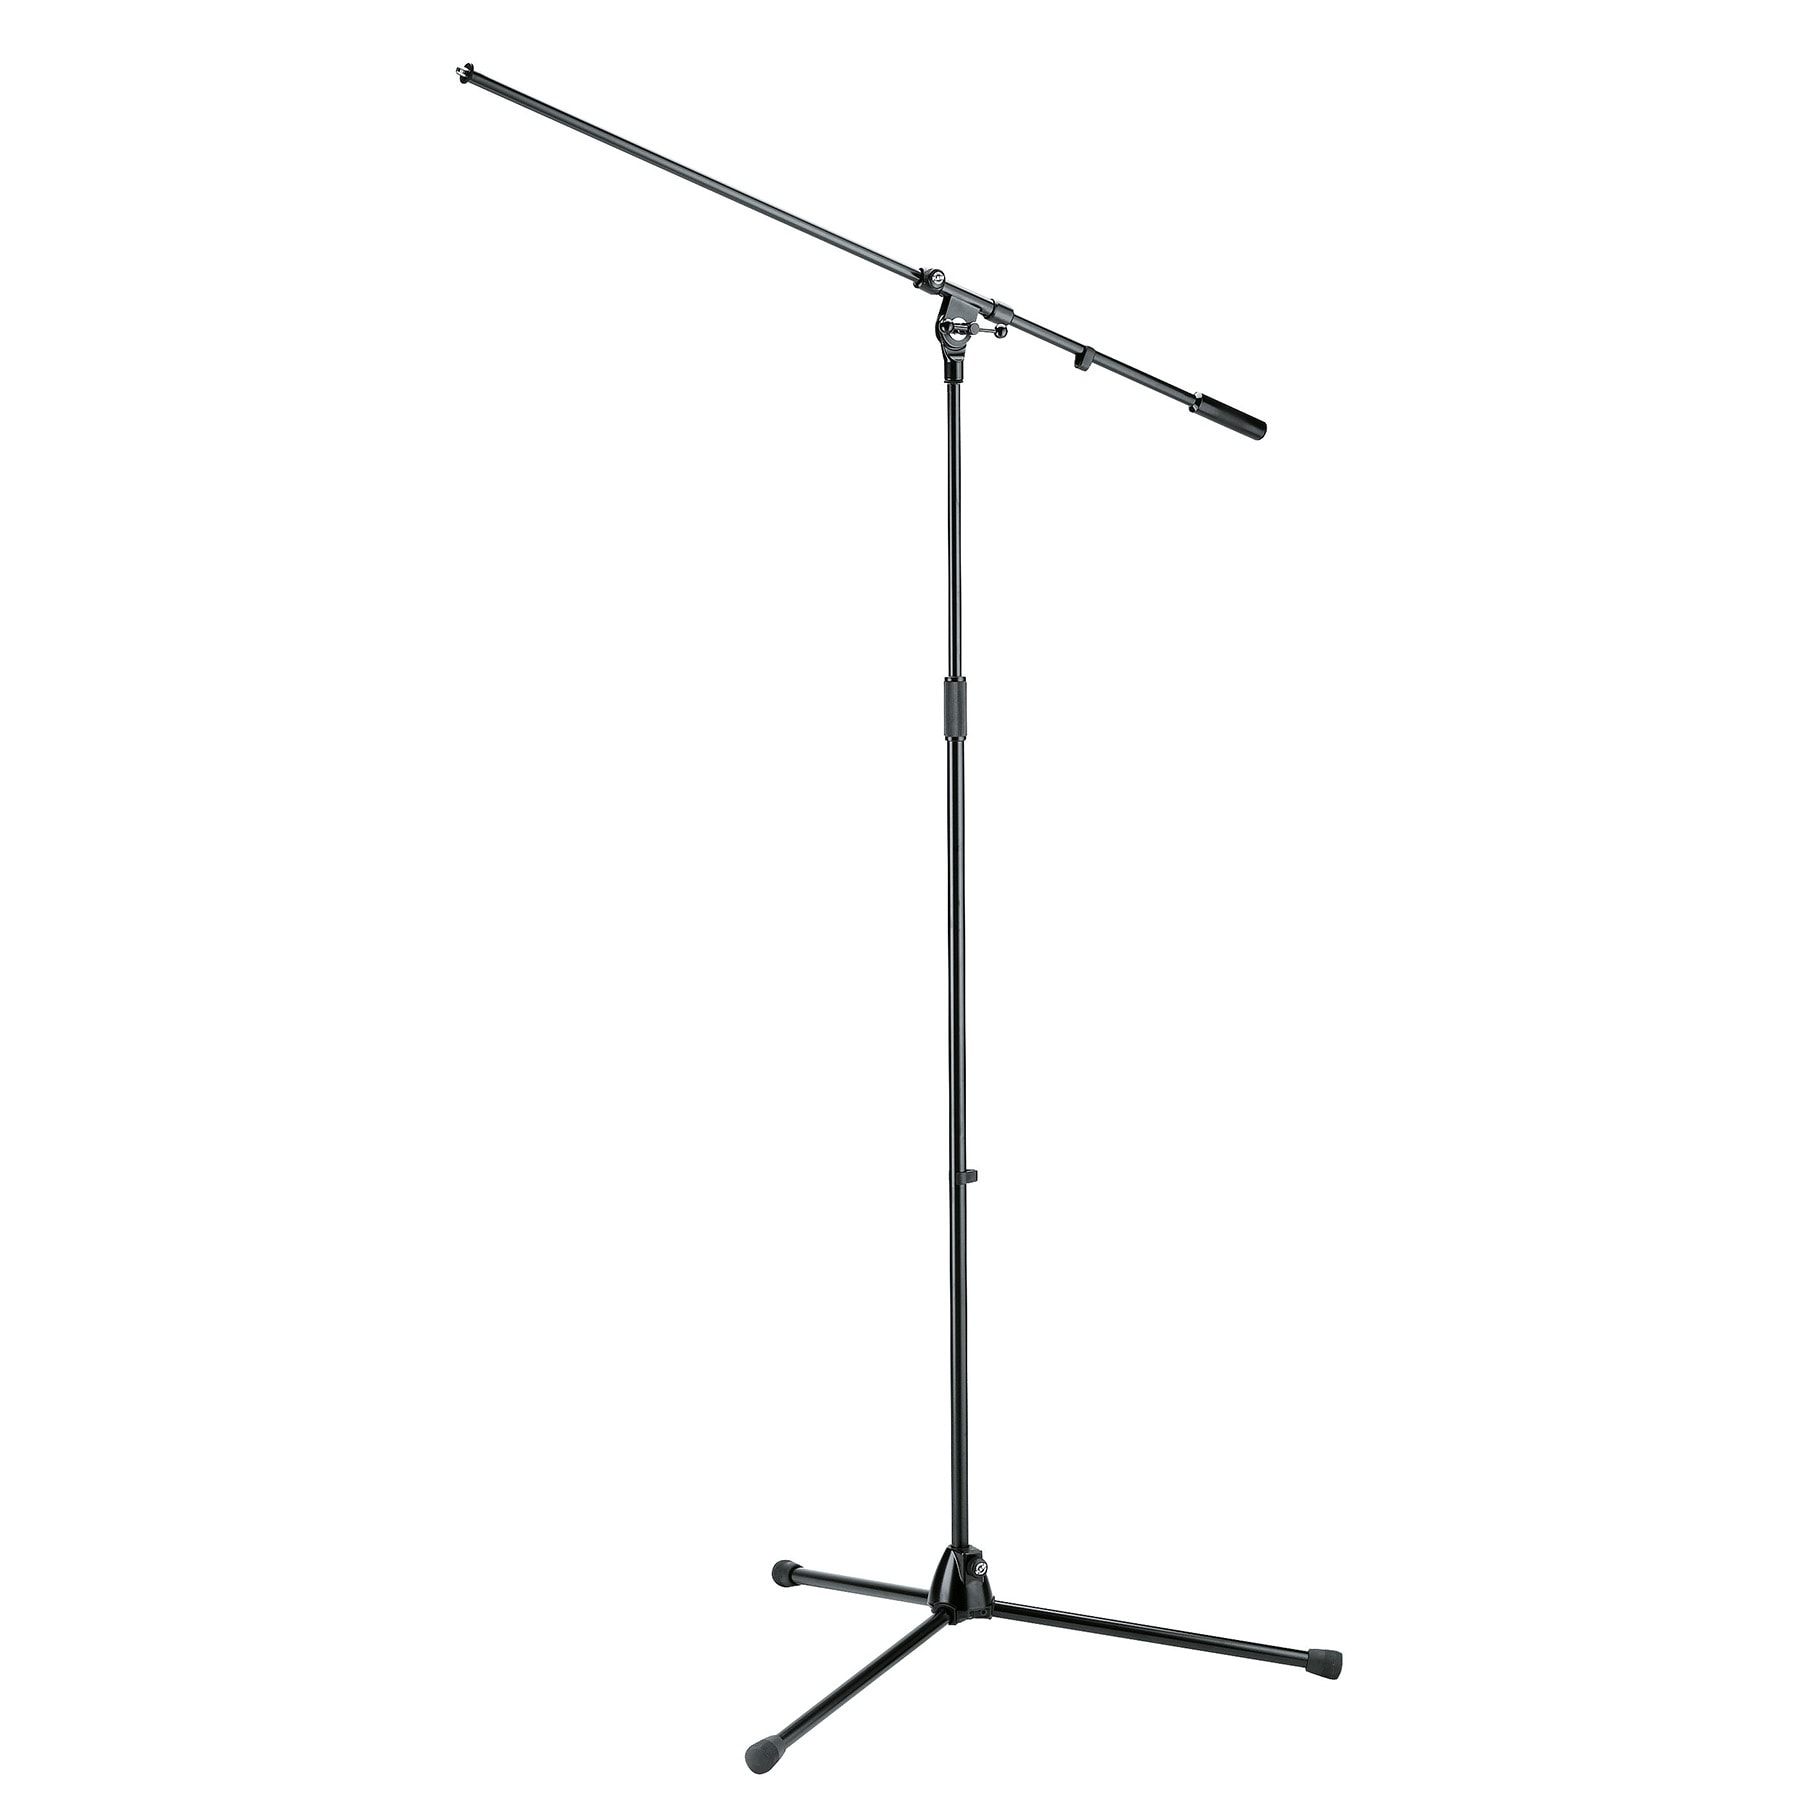 KM21021 - Overhead microphone stand